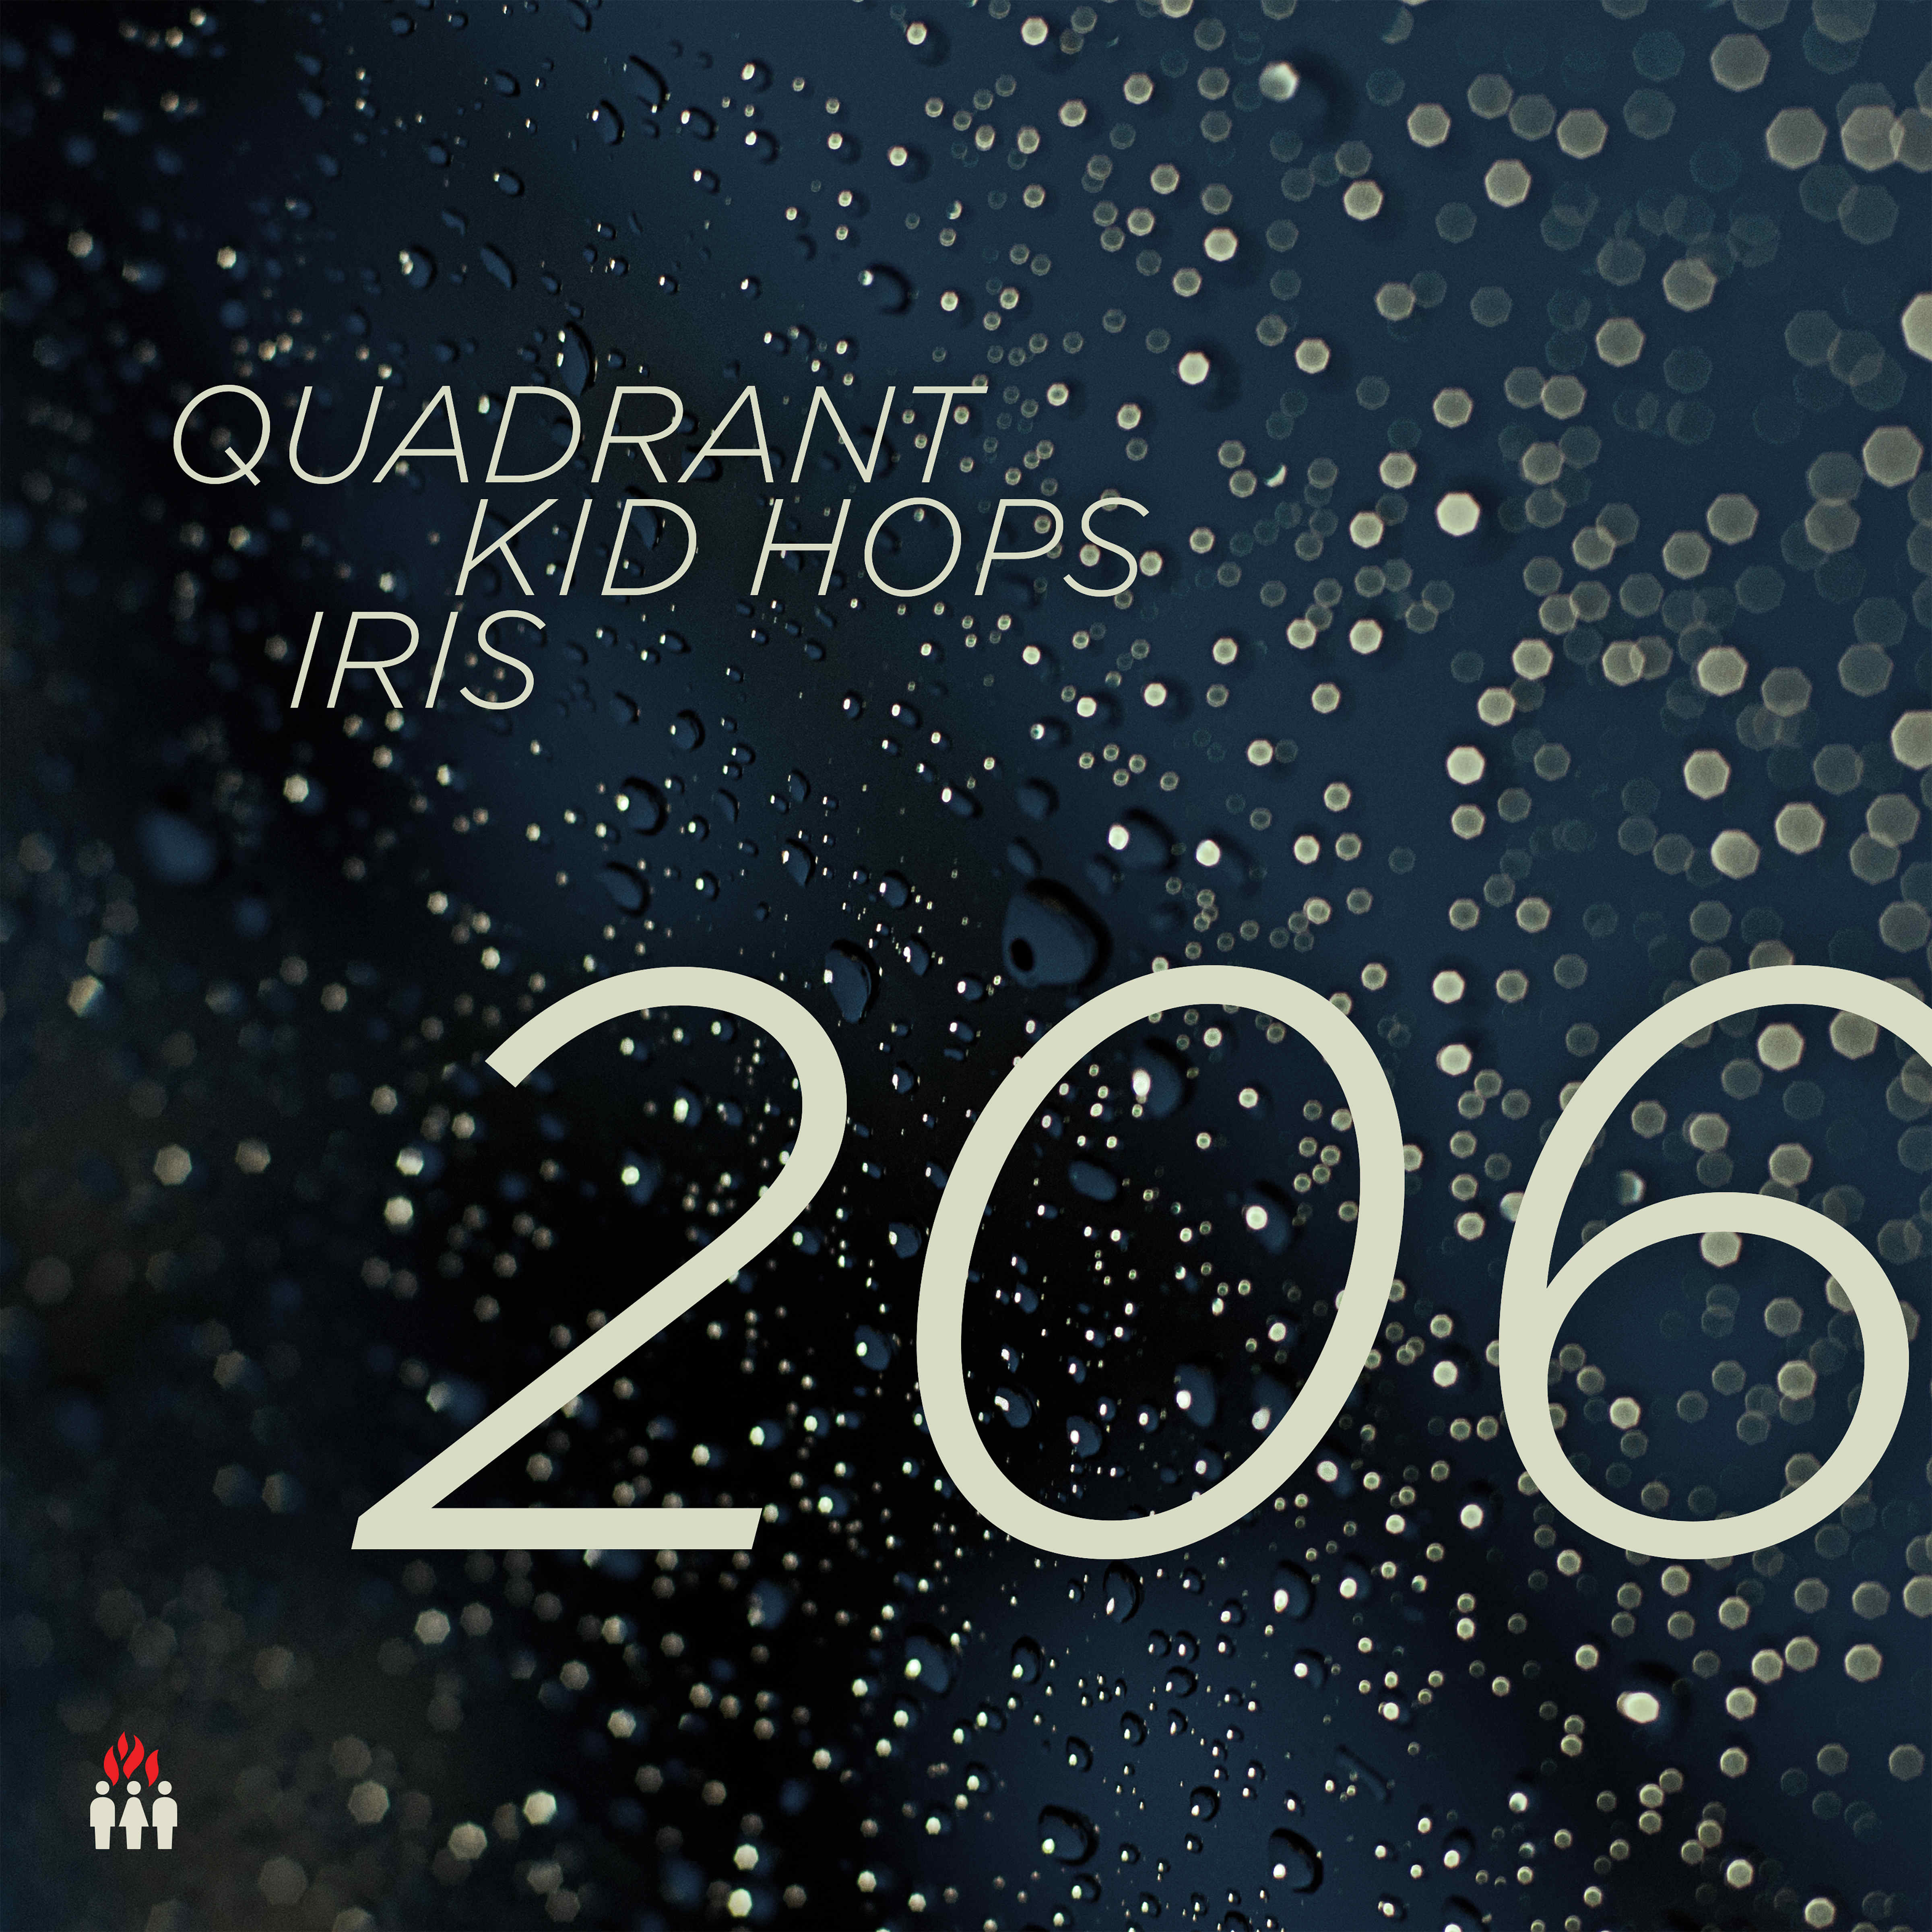 Quadrant, Kid Hops & Iris/206 DLP